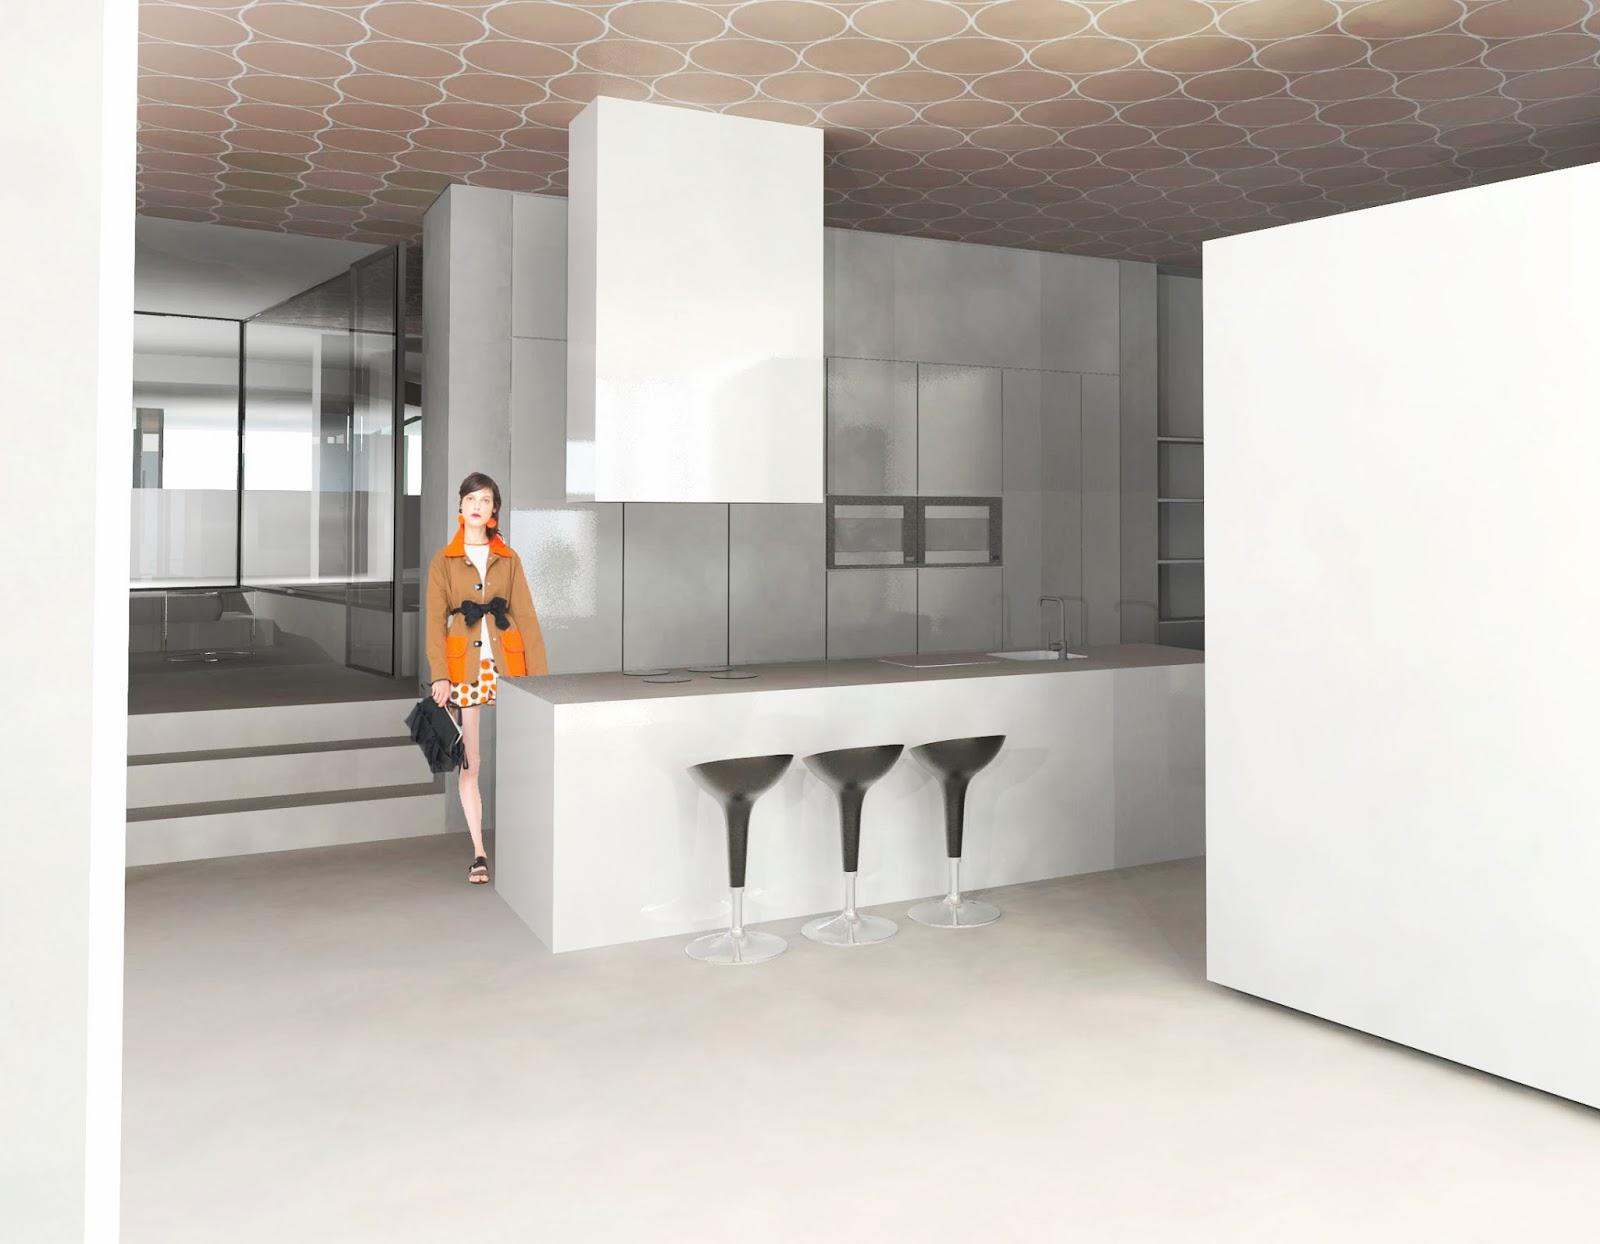 Entrecotas vivienda taller para un dise ador de moda madrid - Disenador de interiores madrid ...